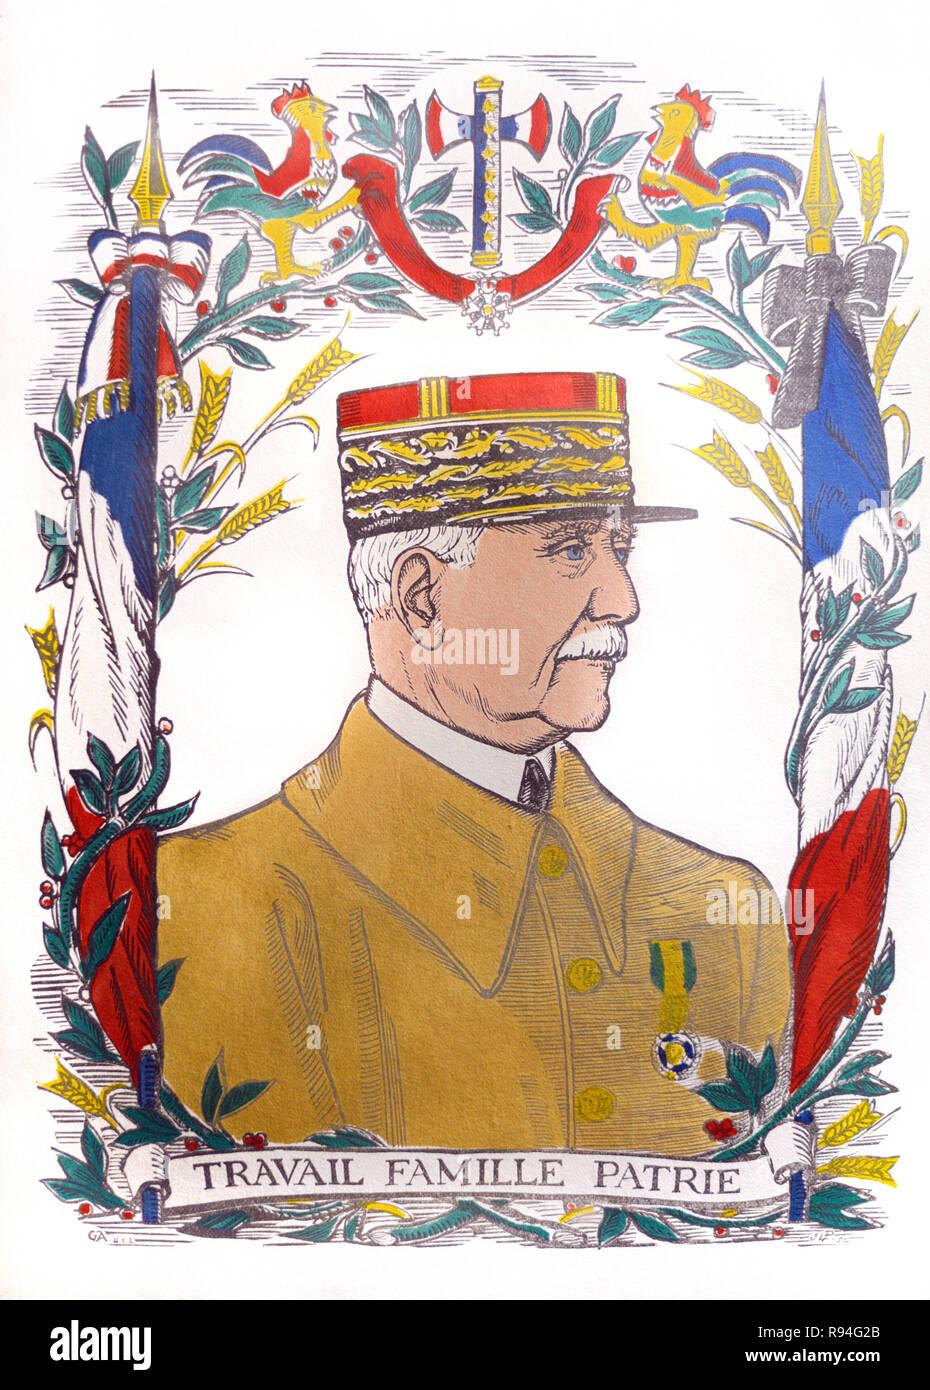 Portrait of Marshal Pétain & French Nationalist Symbols c1940 - Stock Image